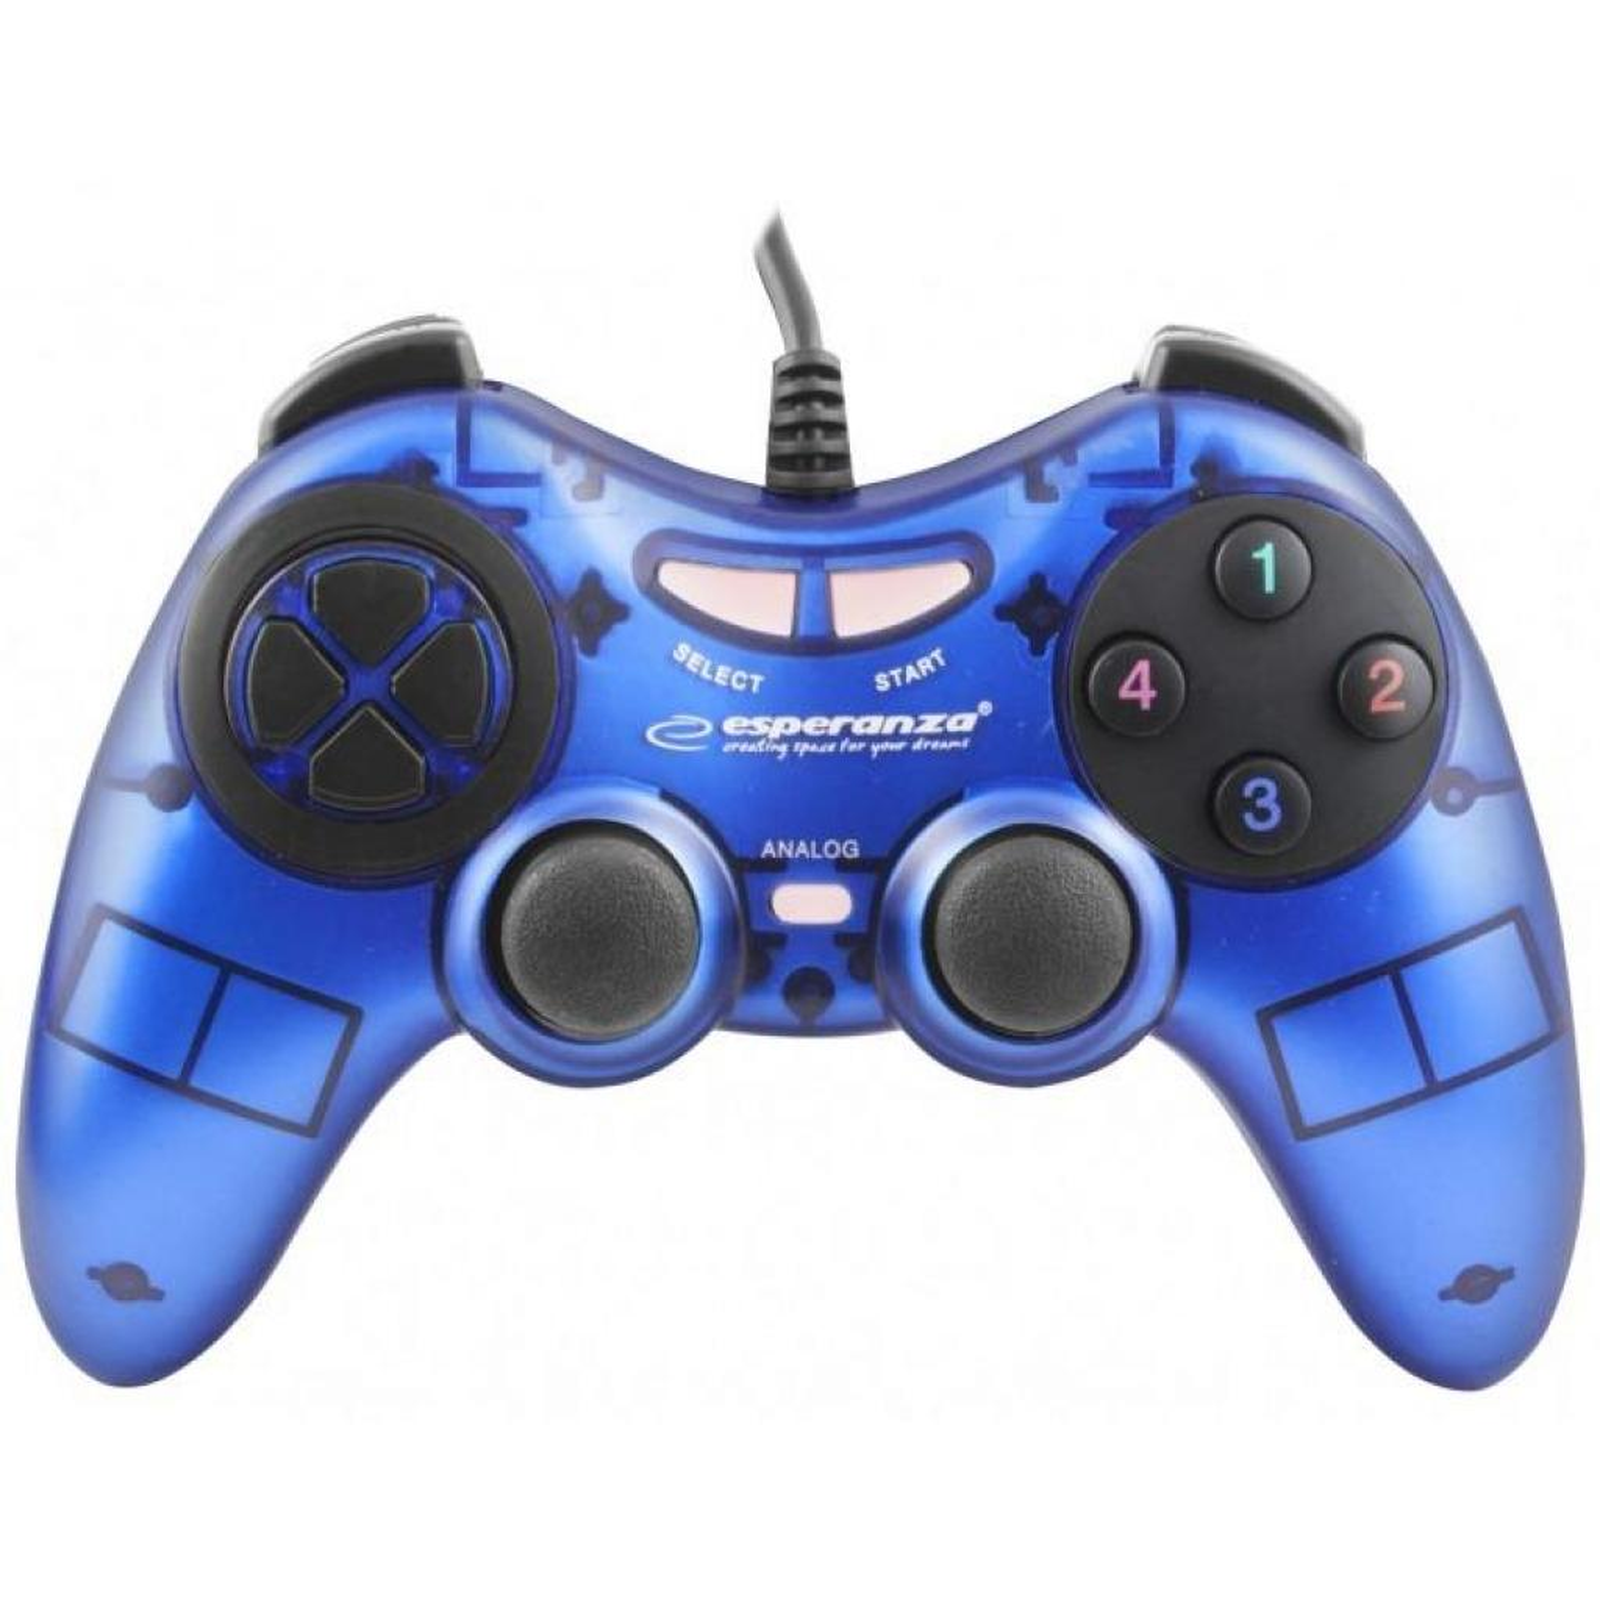 Геймпад Esperanza Fighter PC Blue (EGG105B) изображение 3